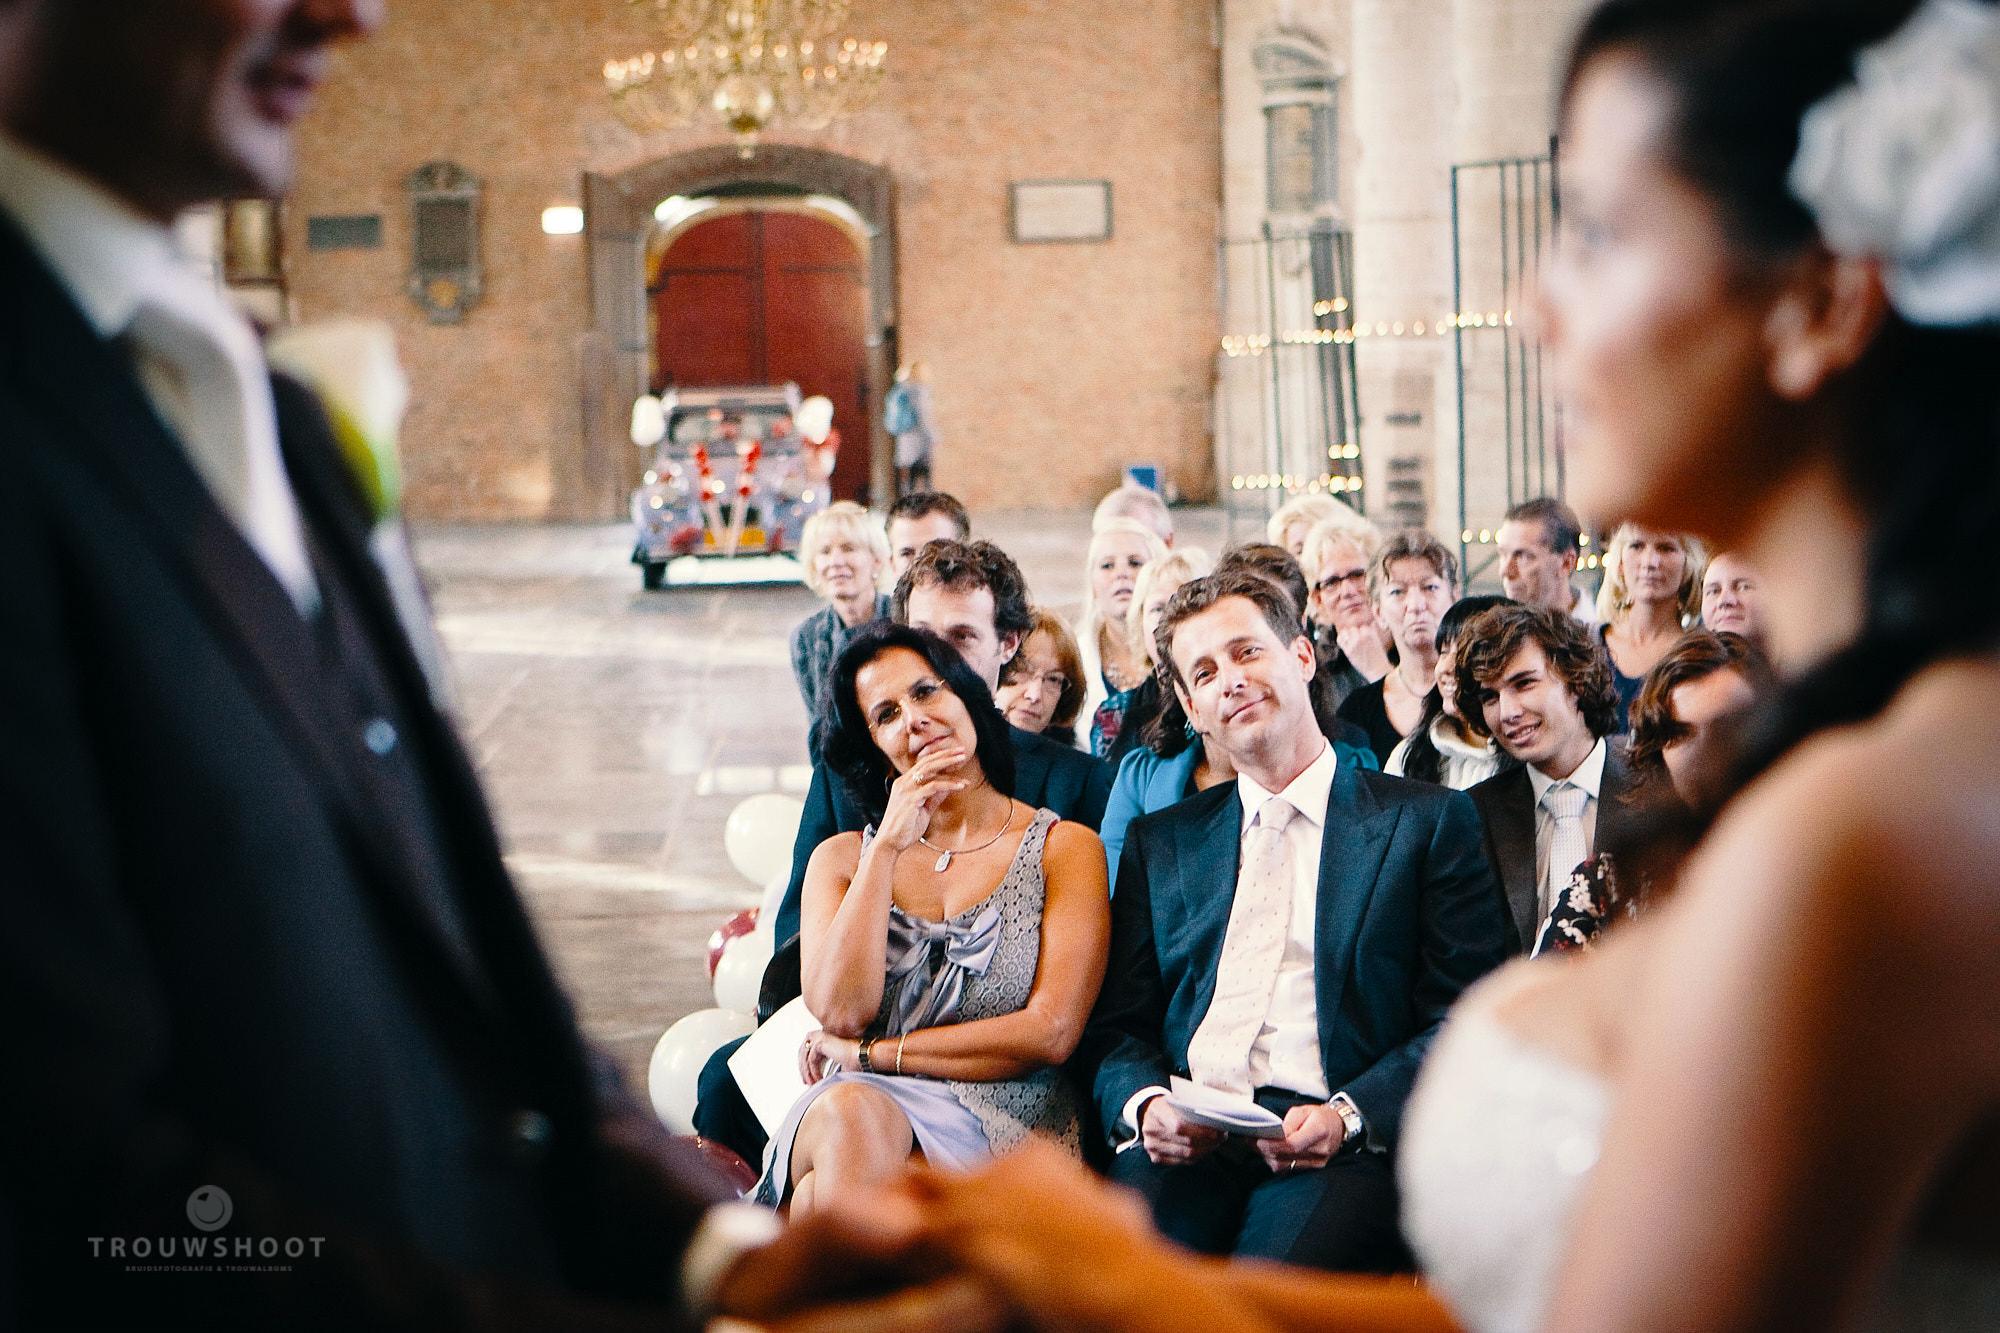 trouwshoot_bruidsfotografie_trouwfoto_163.jpg